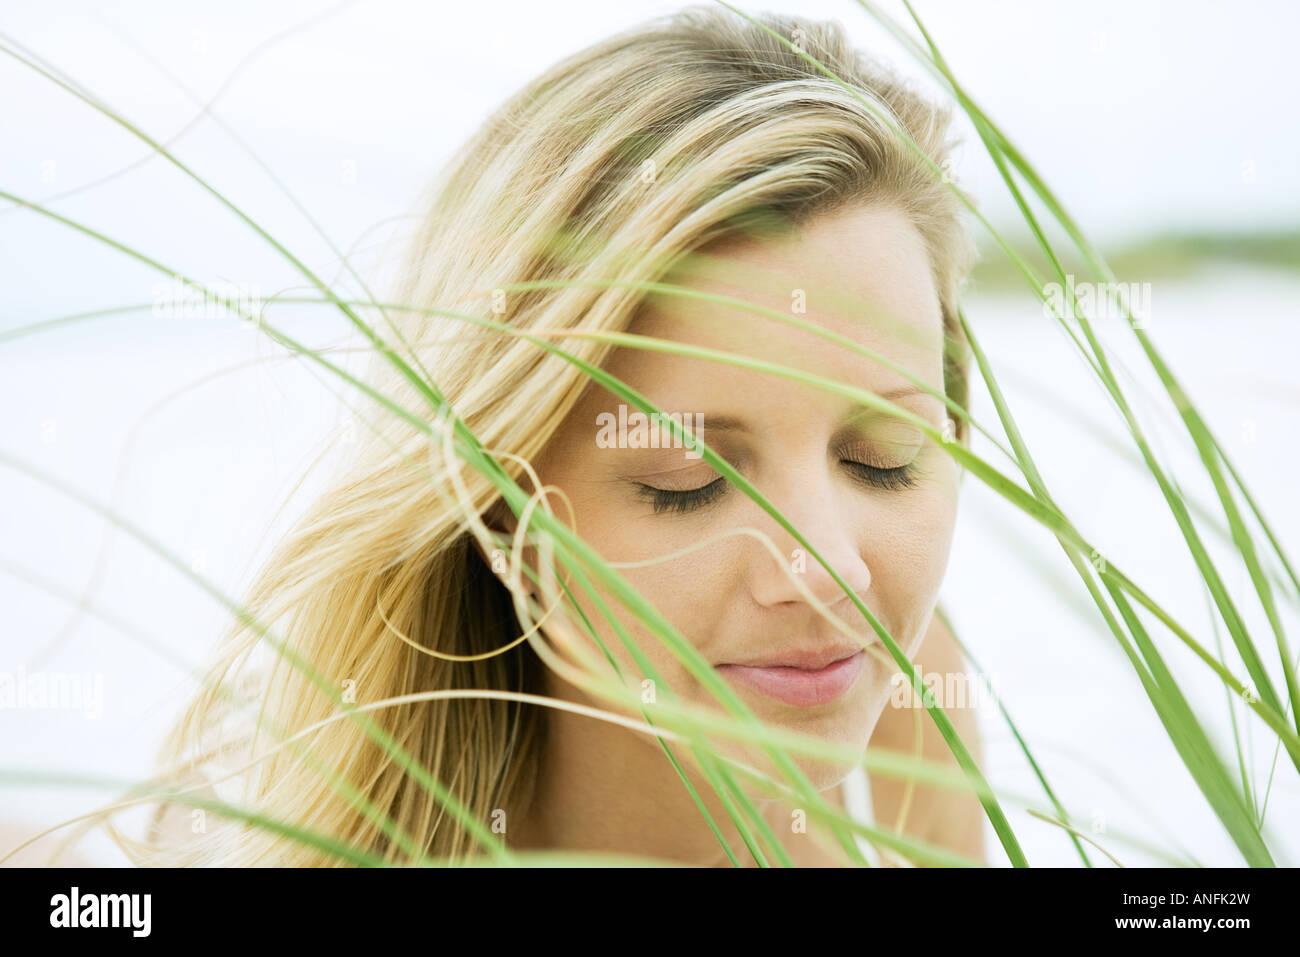 Woman closing eyes, seen through grass, close-up - Stock Image